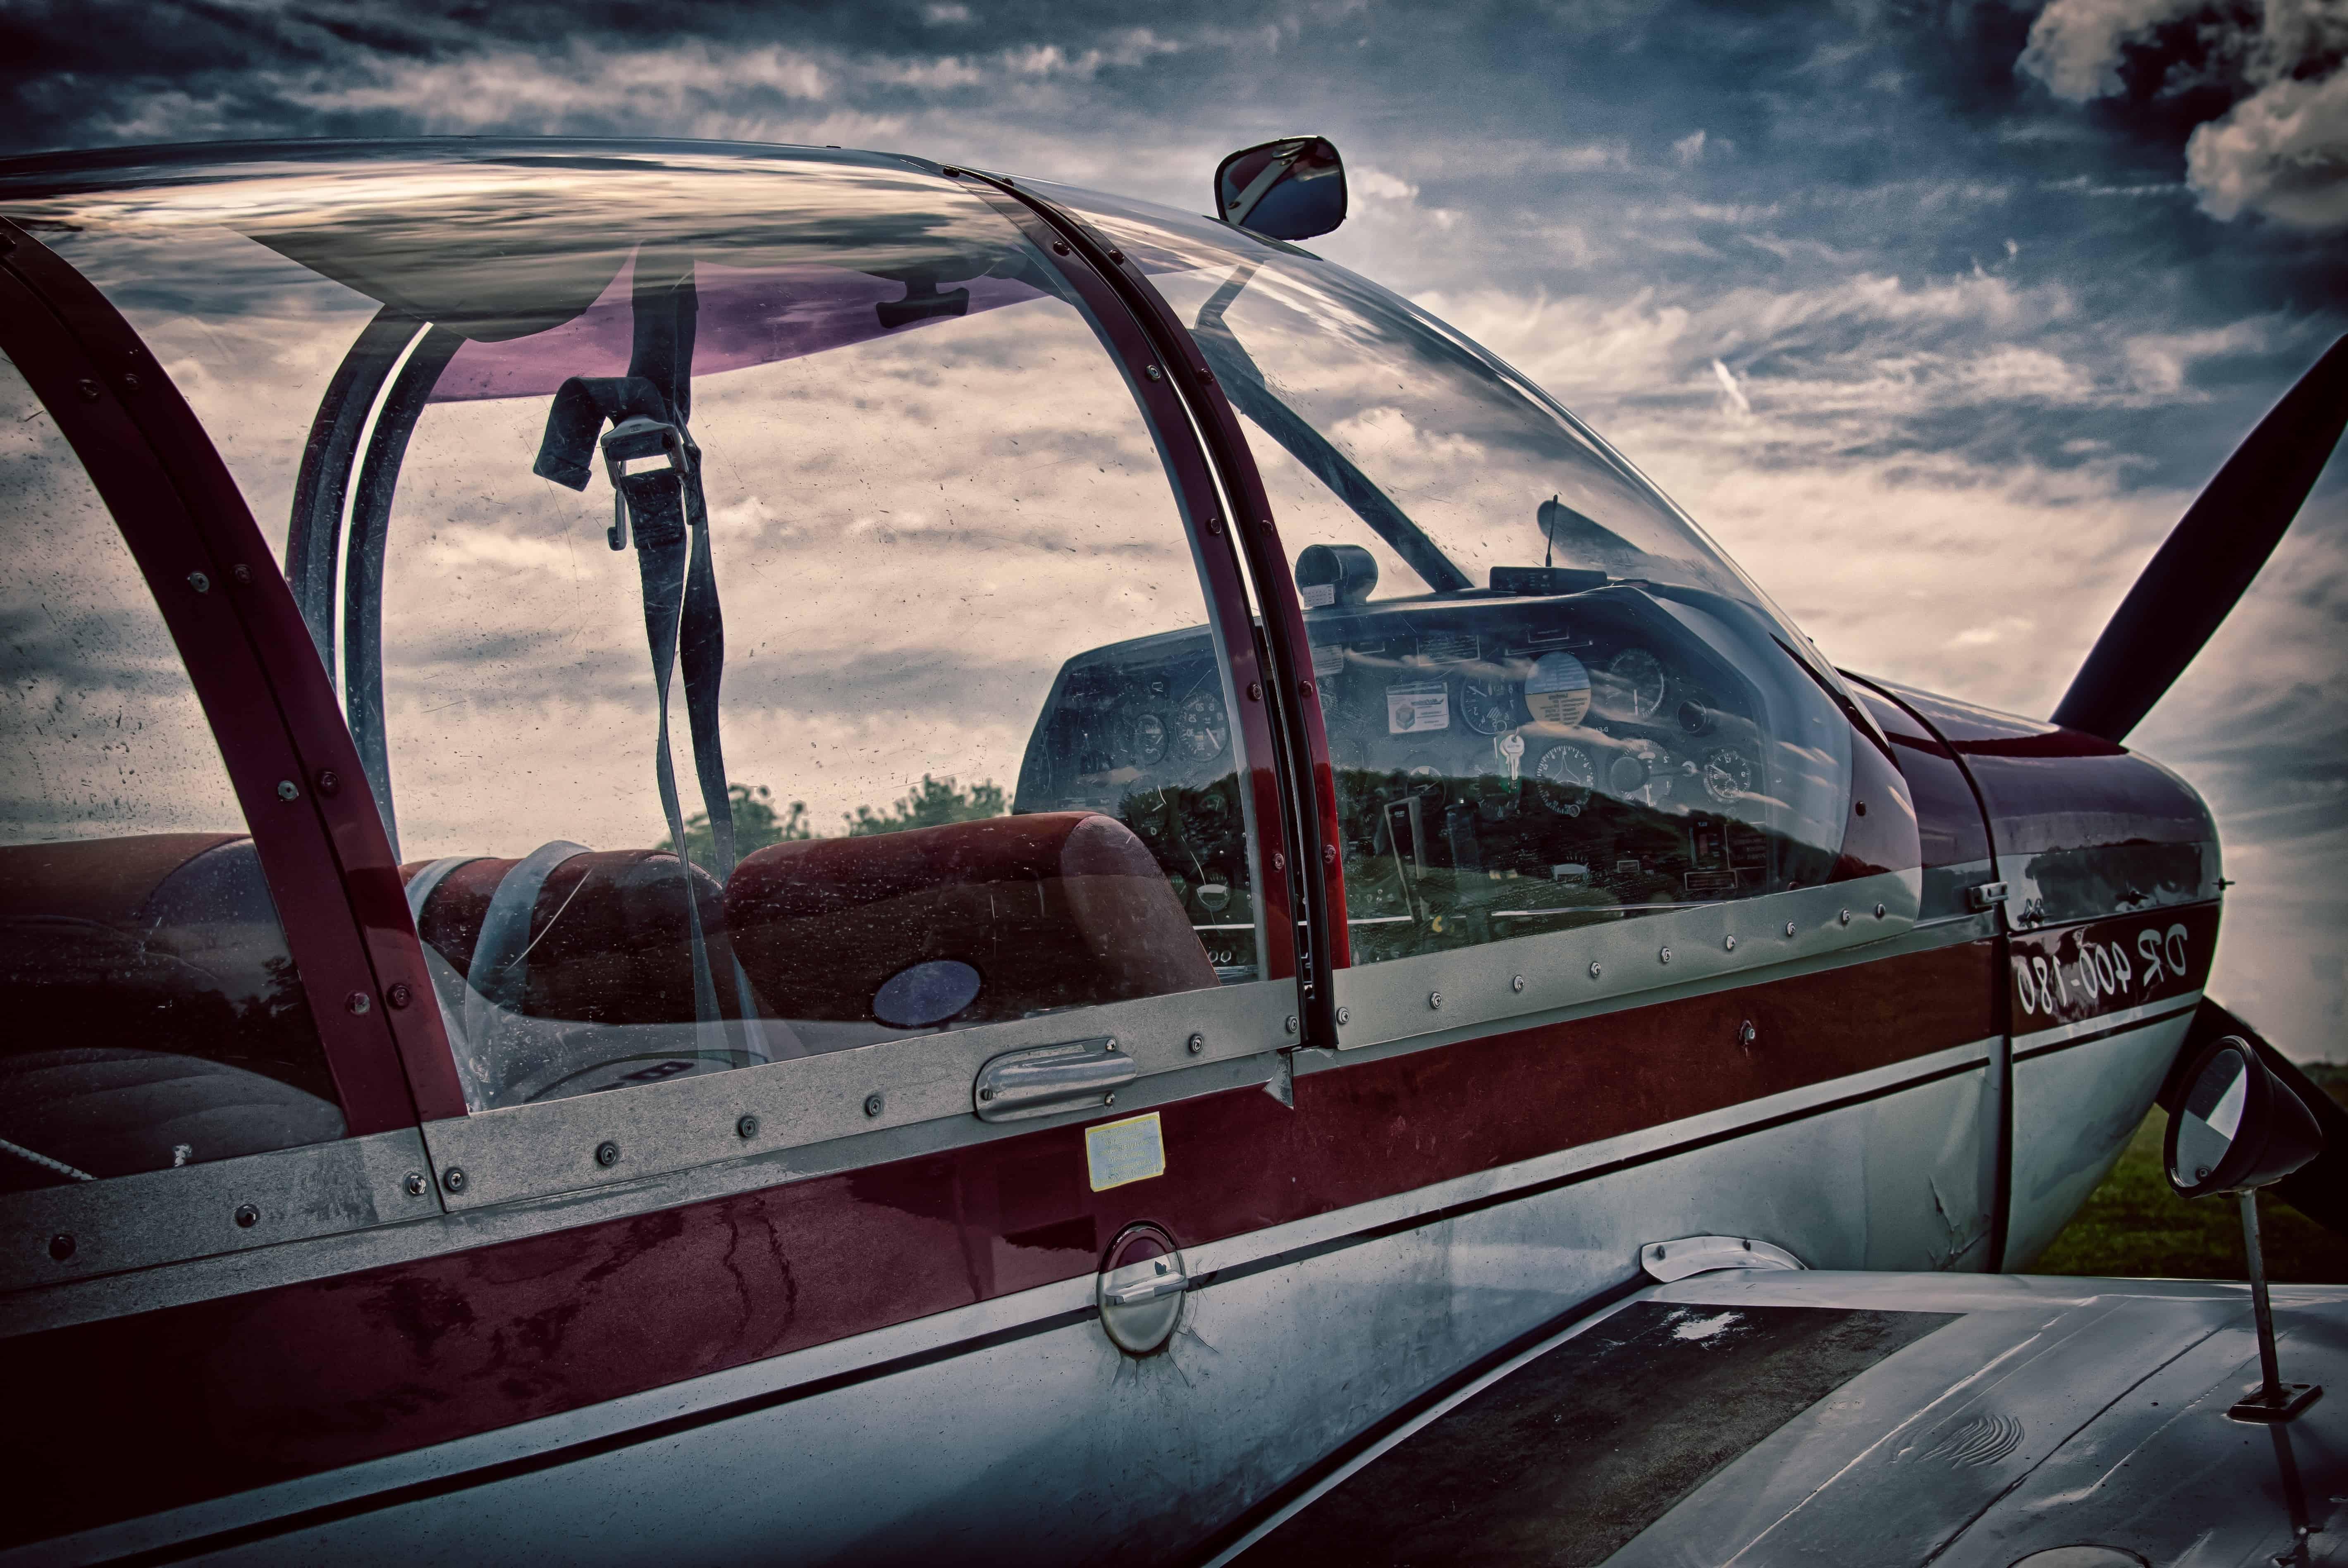 Flugzeug, Fahrzeug, Himmel, Luftfahrt, Wolke, Sonnenuntergang